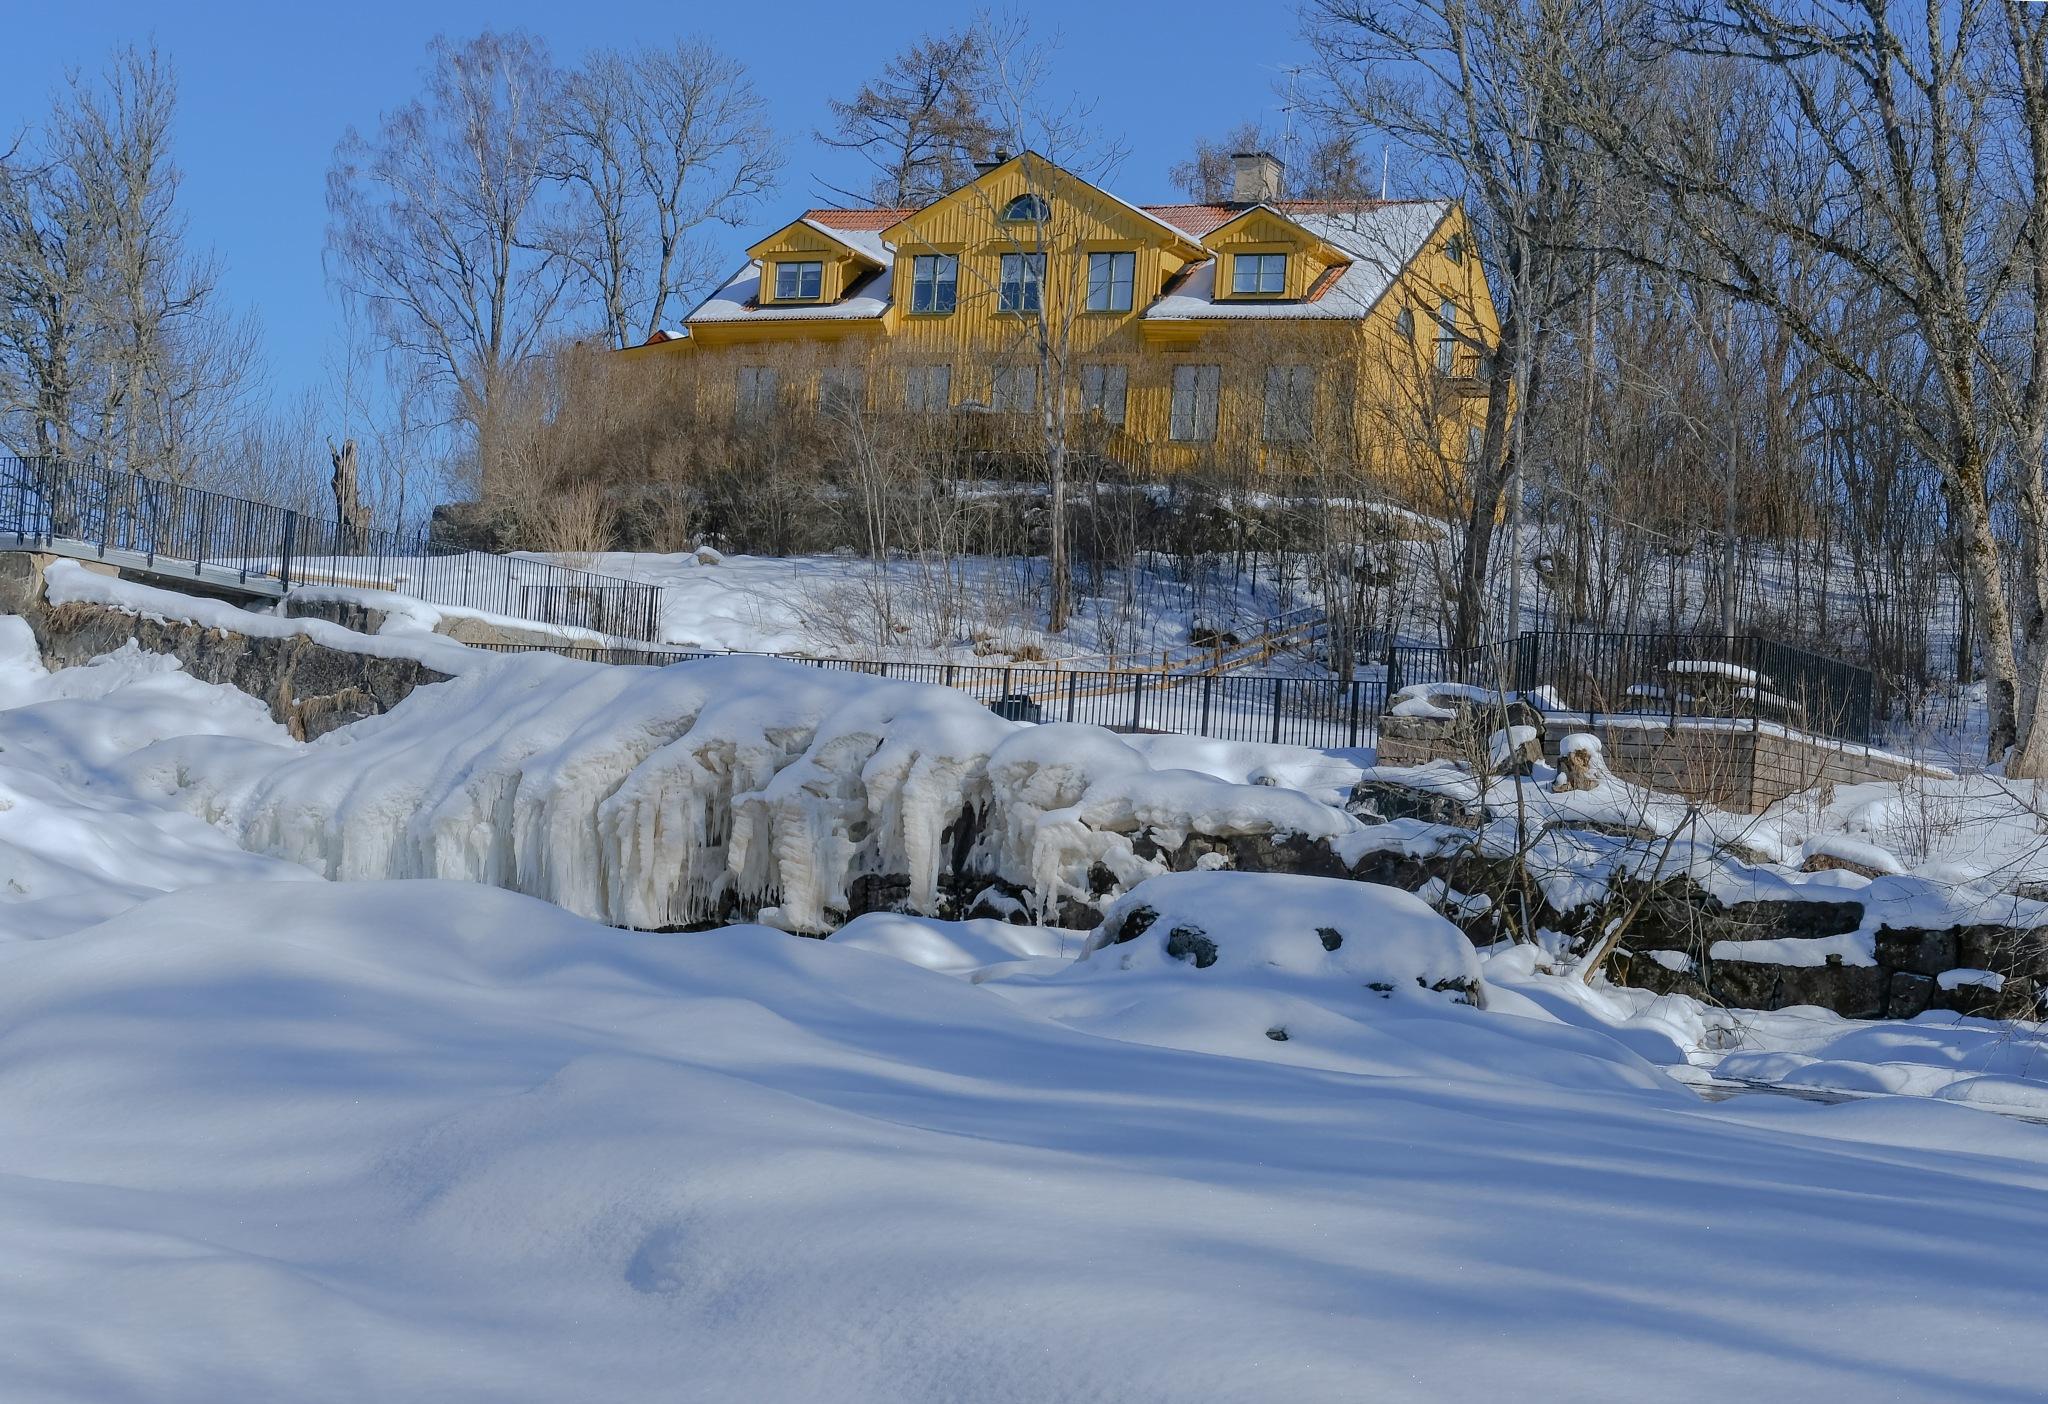 winter by larserik.keding